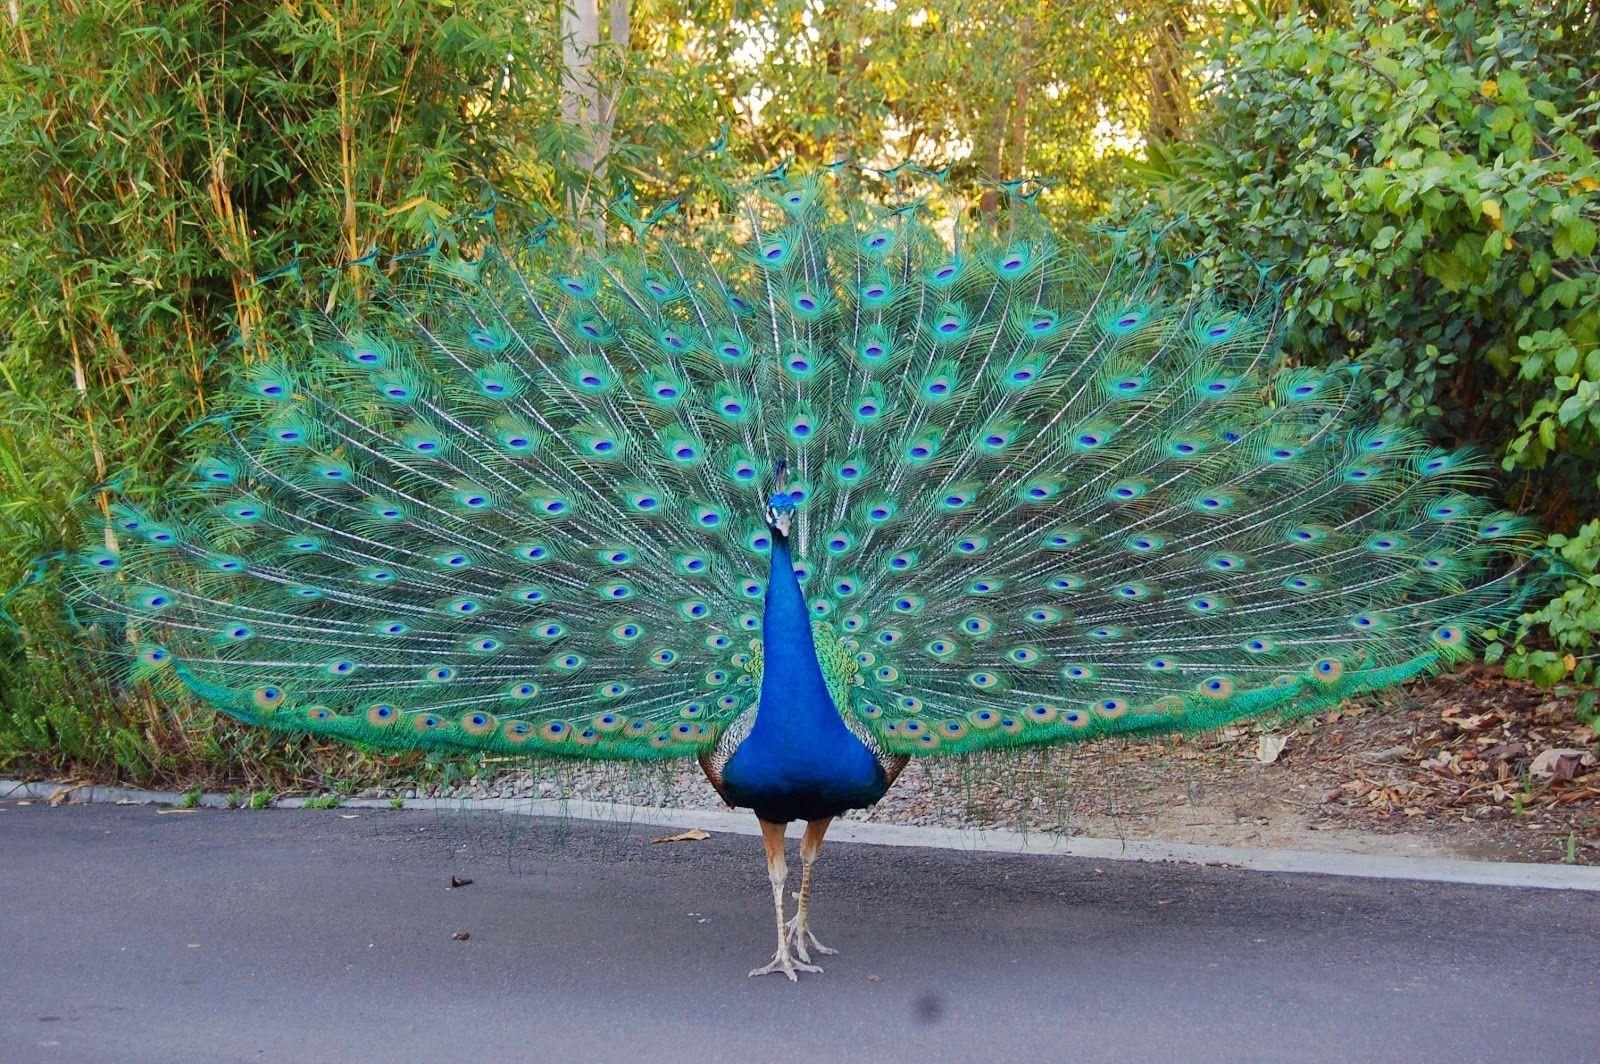 Male vs Female peacock